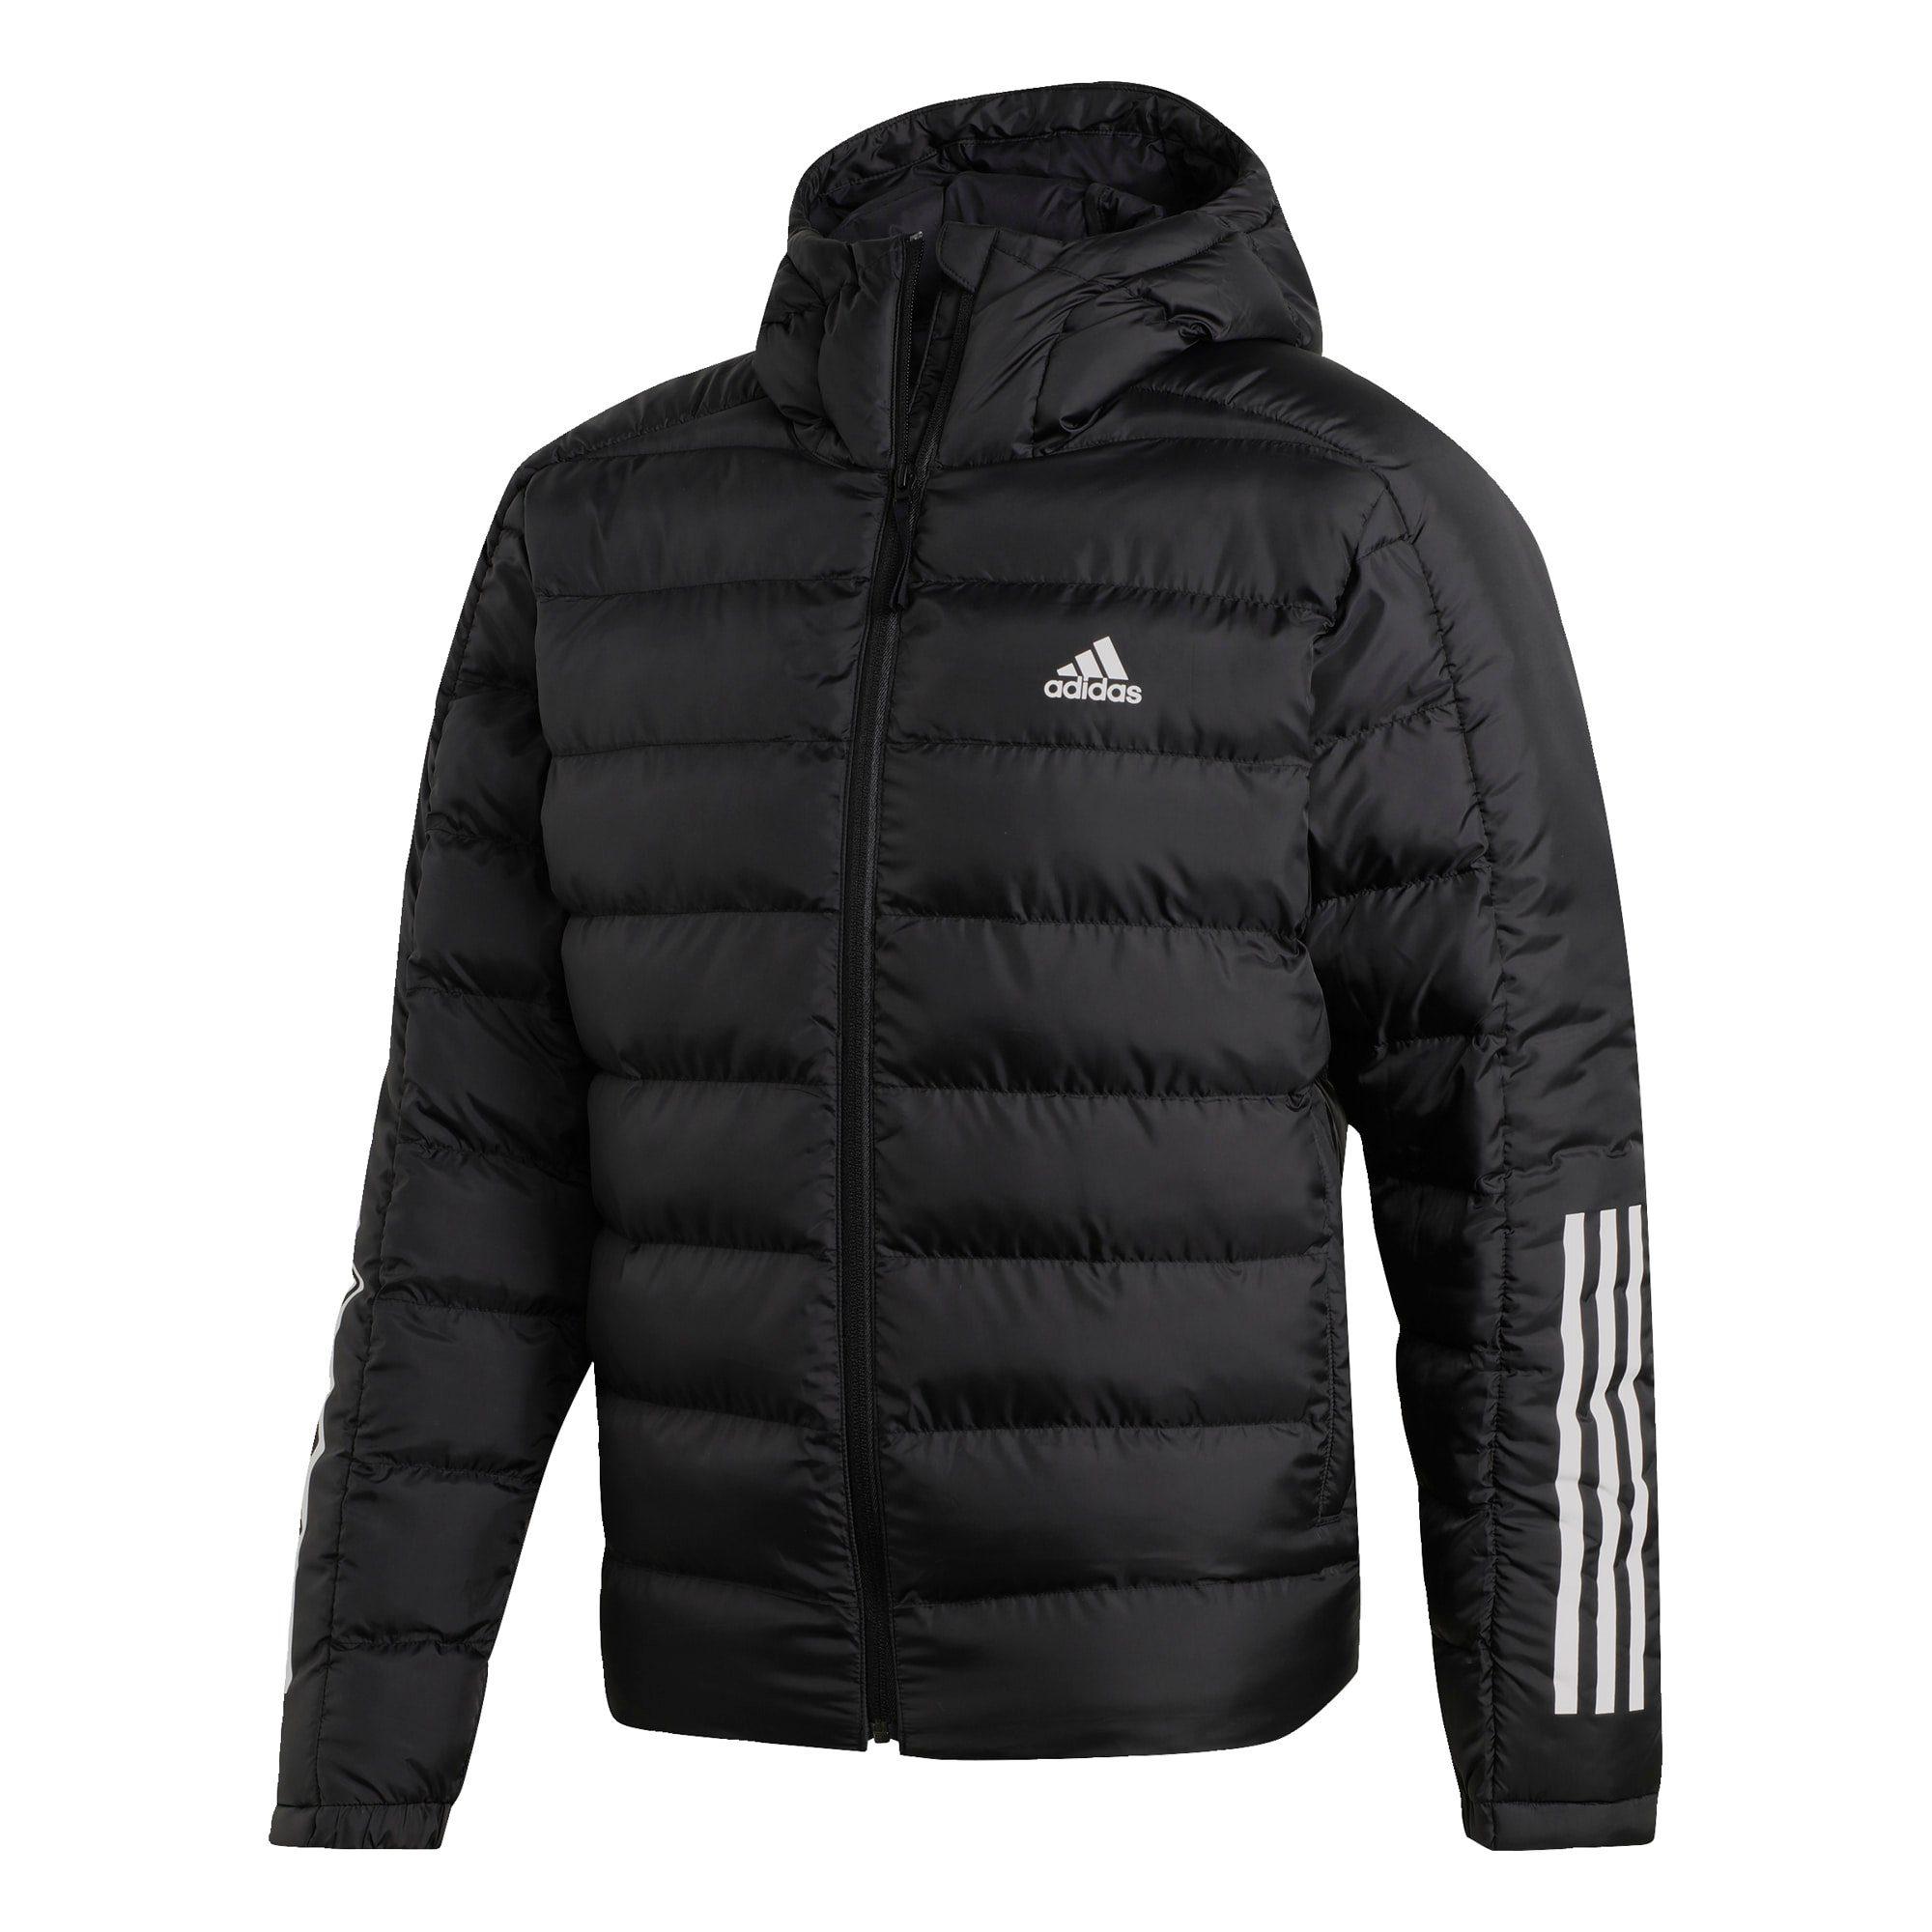 adidas Performance Funktionsjacke »Itavic 3 Stripes 2.0 Jacket« online kaufen | OTTO